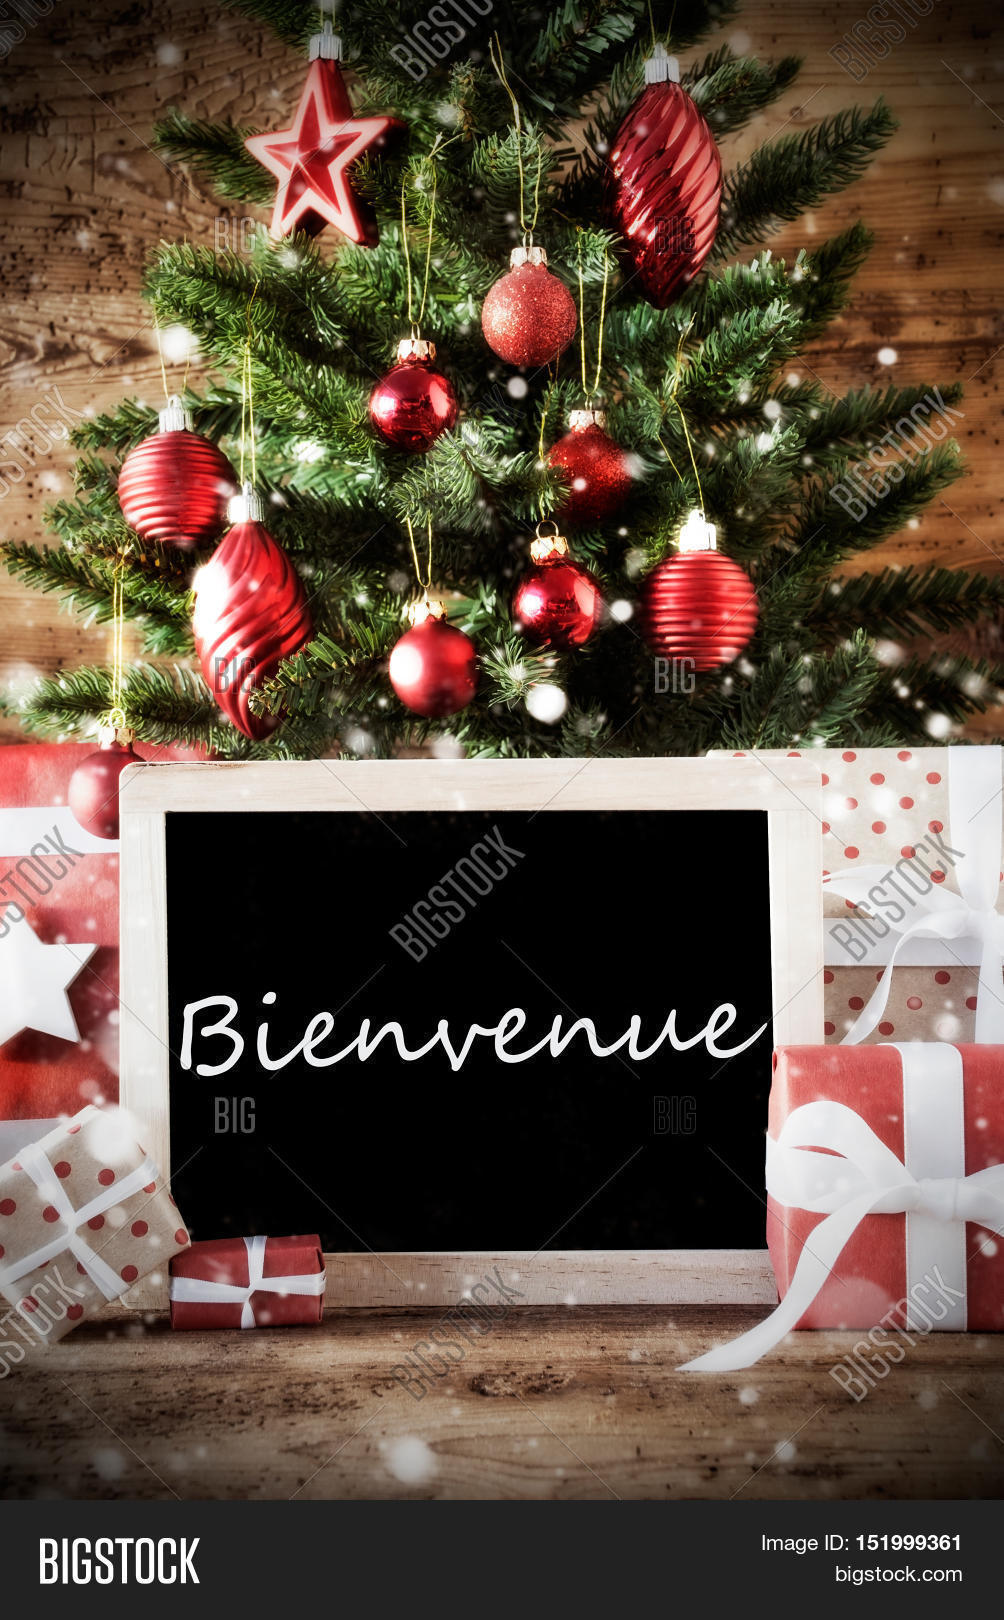 Christmas Card Seasons Image & Photo (Free Trial) | Bigstock